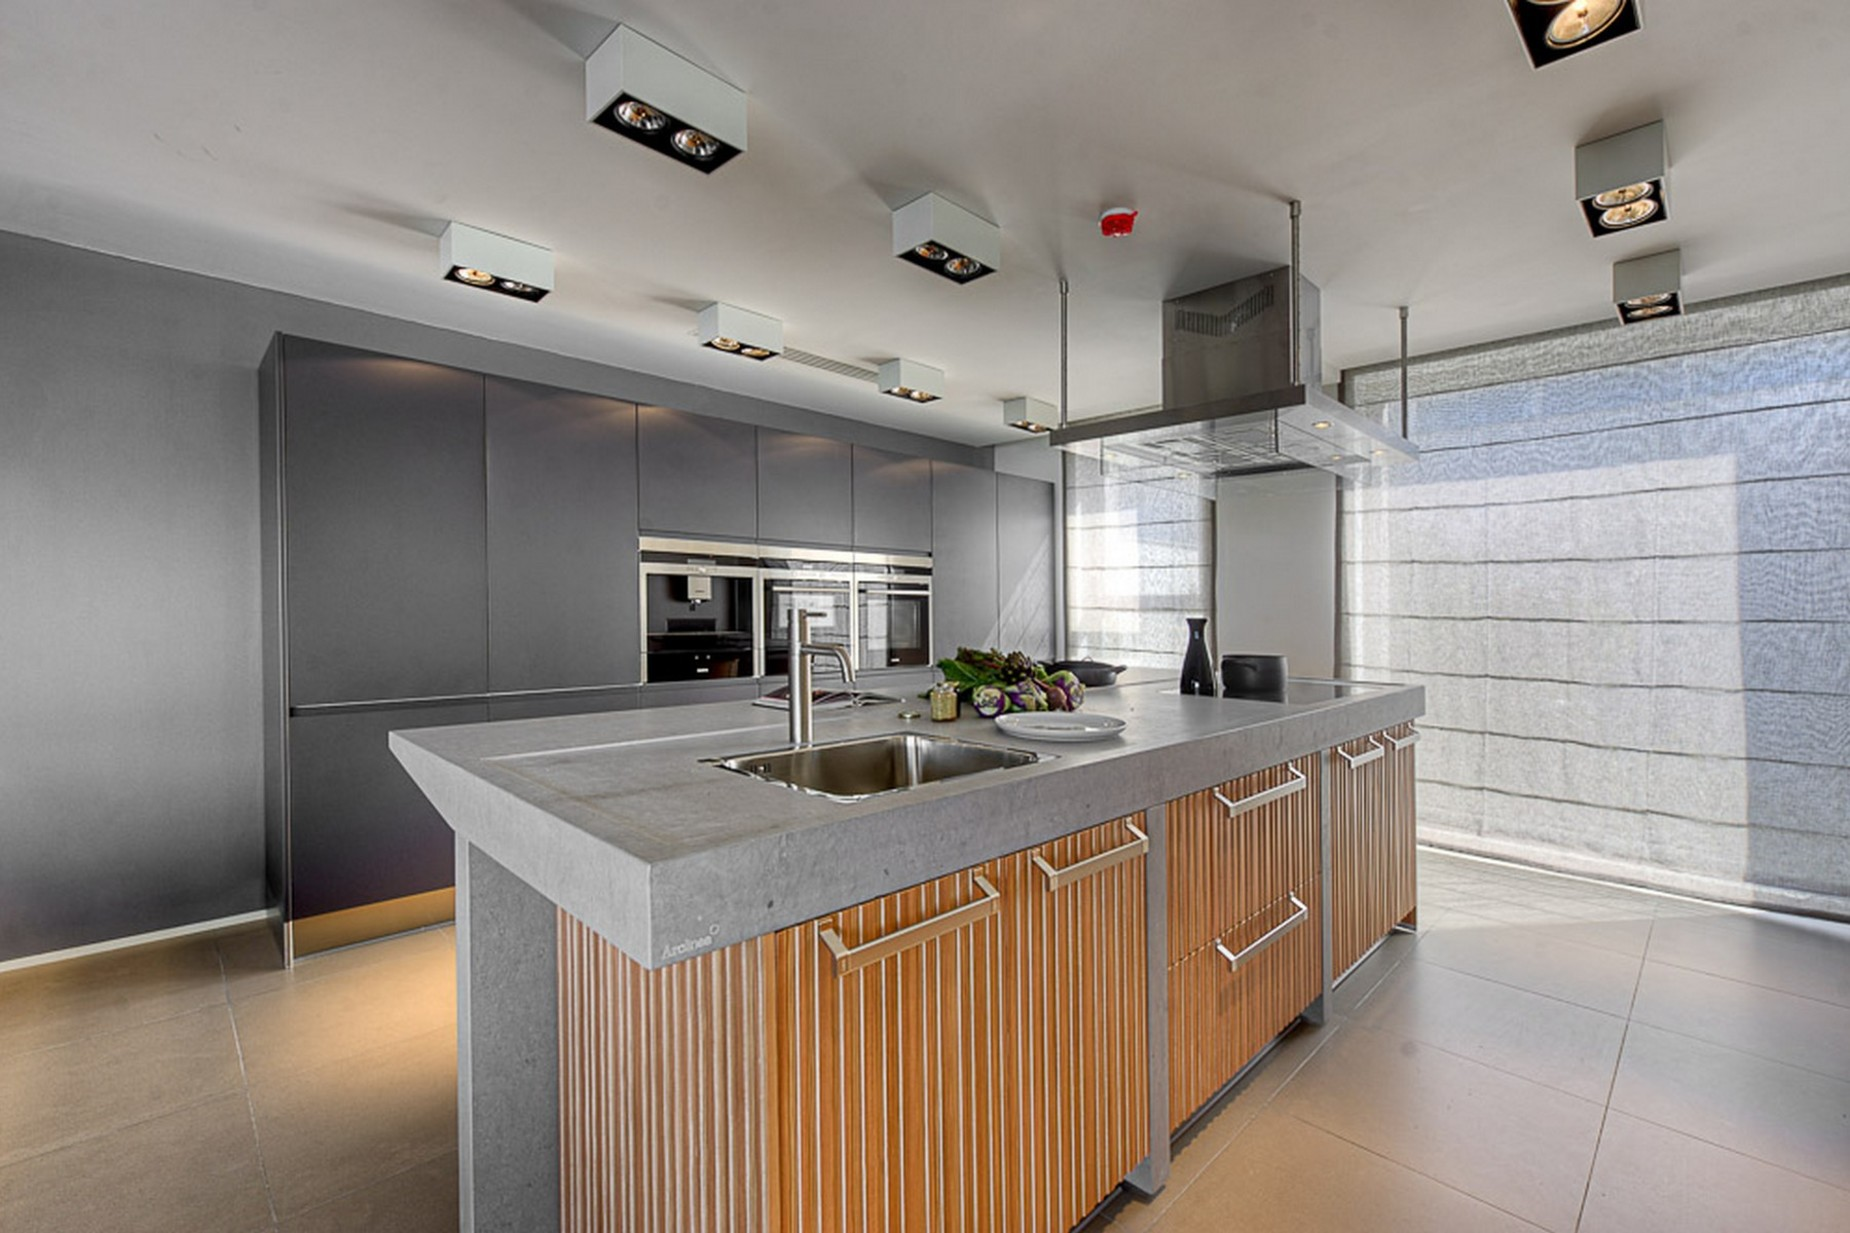 3 bed Villa For Rent in Bahar ic-Caghaq, Bahar ic-Caghaq - thumb 3